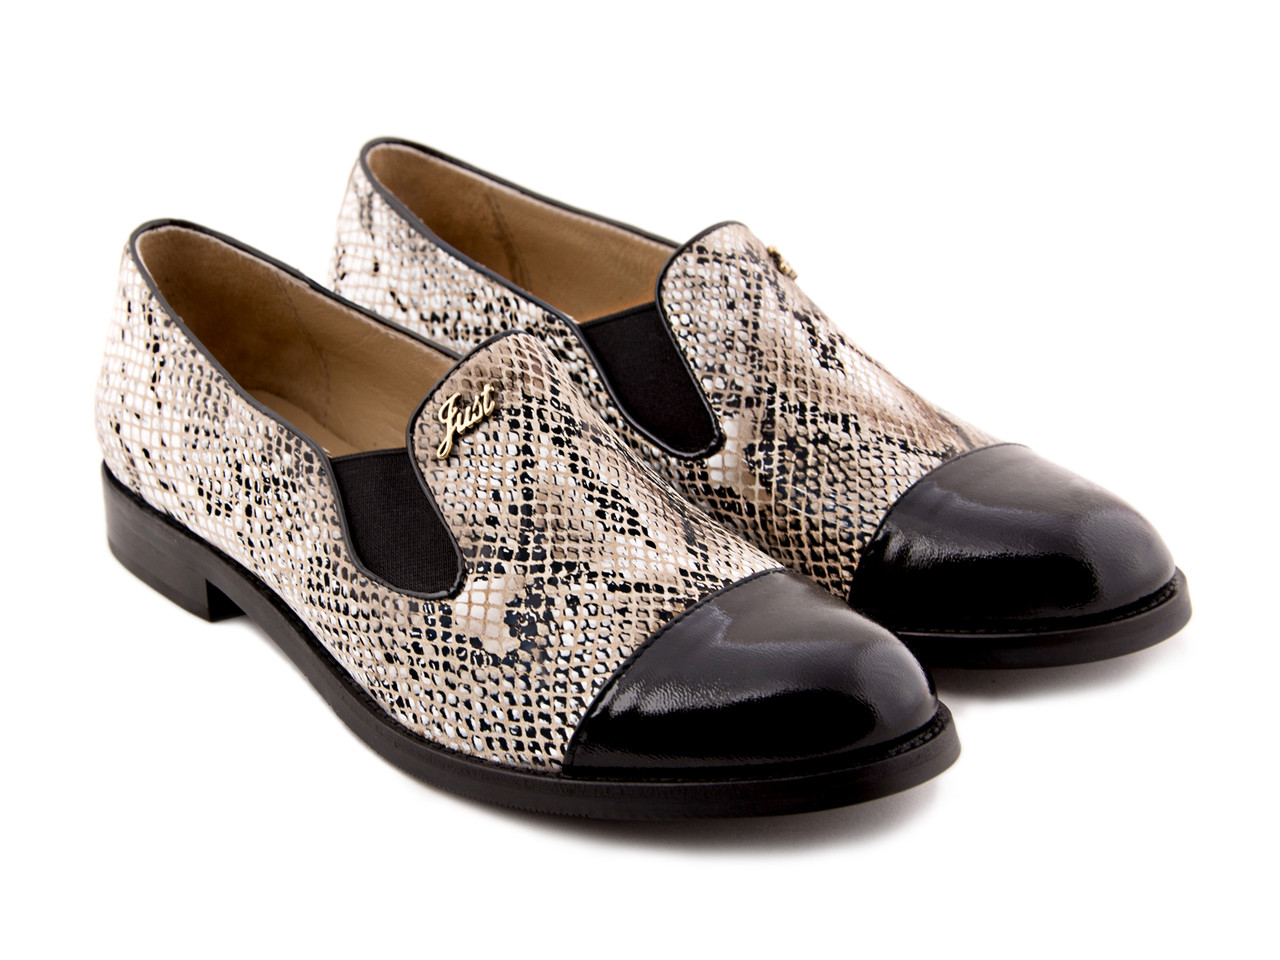 Туфли Etor 4920-525-1044 39 бежевые